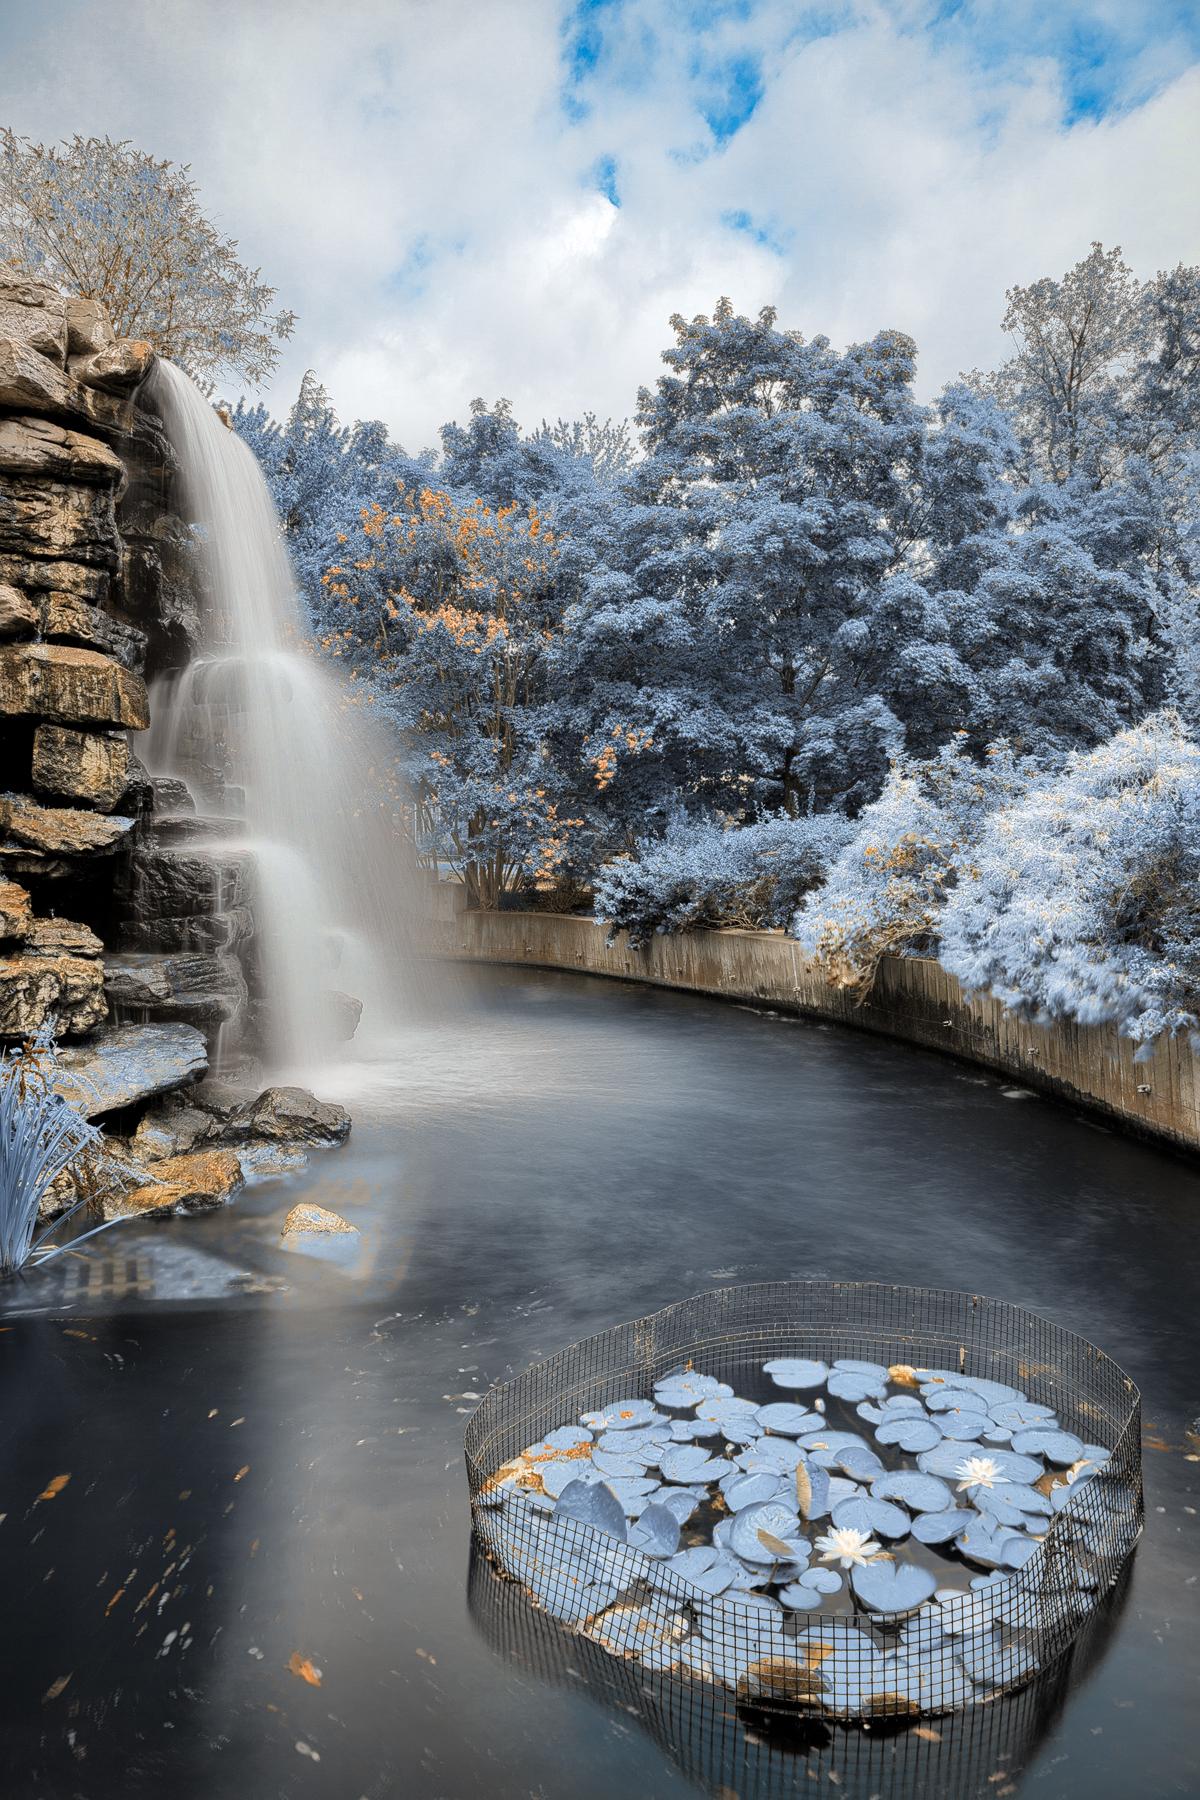 Zoo waterfall - winter blue hdr photo